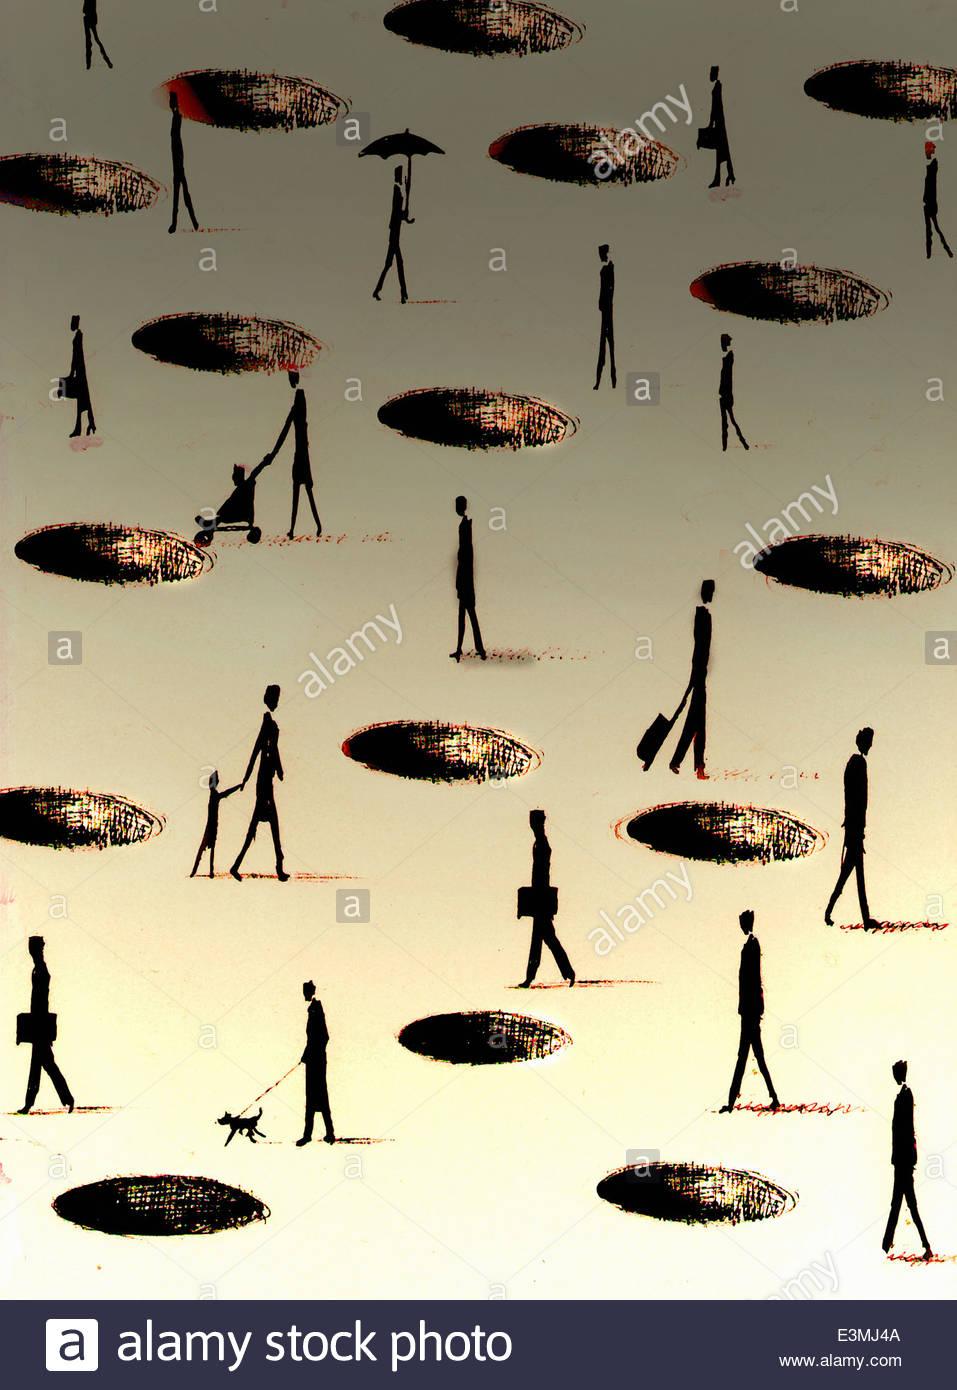 People walking around holes in ground - Stock Image